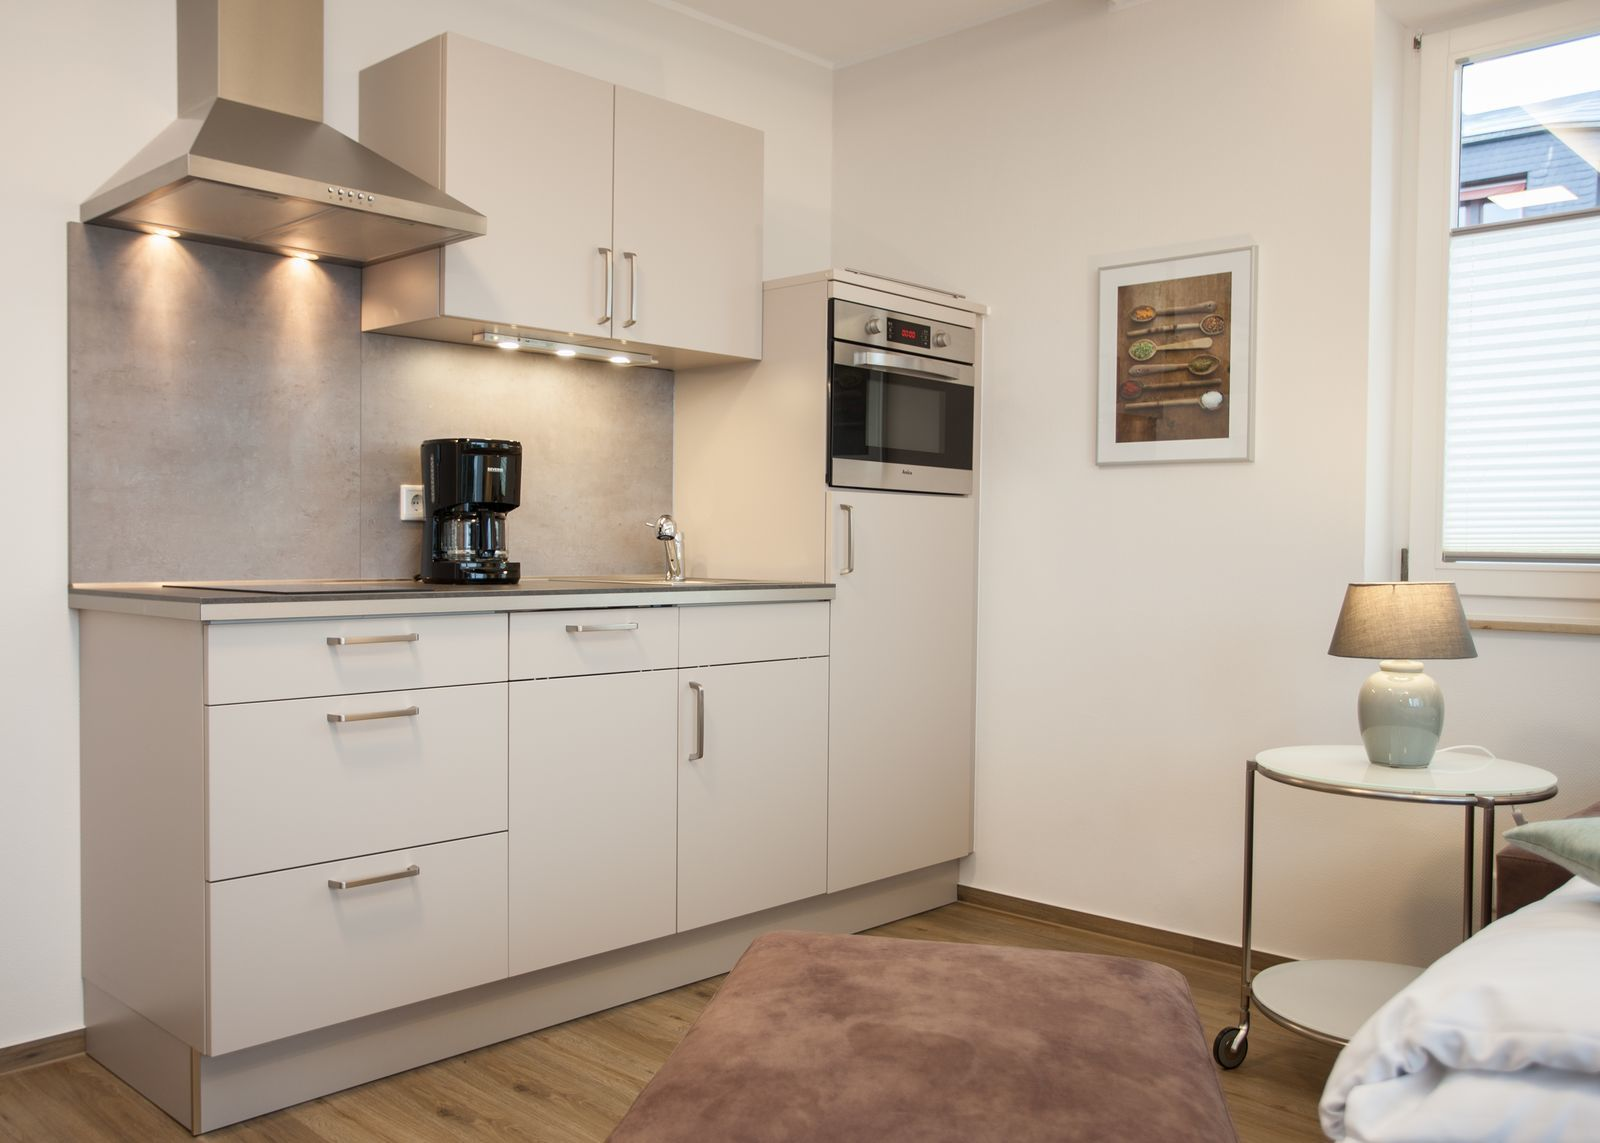 Appartement - Fichtenweg 26A1-W